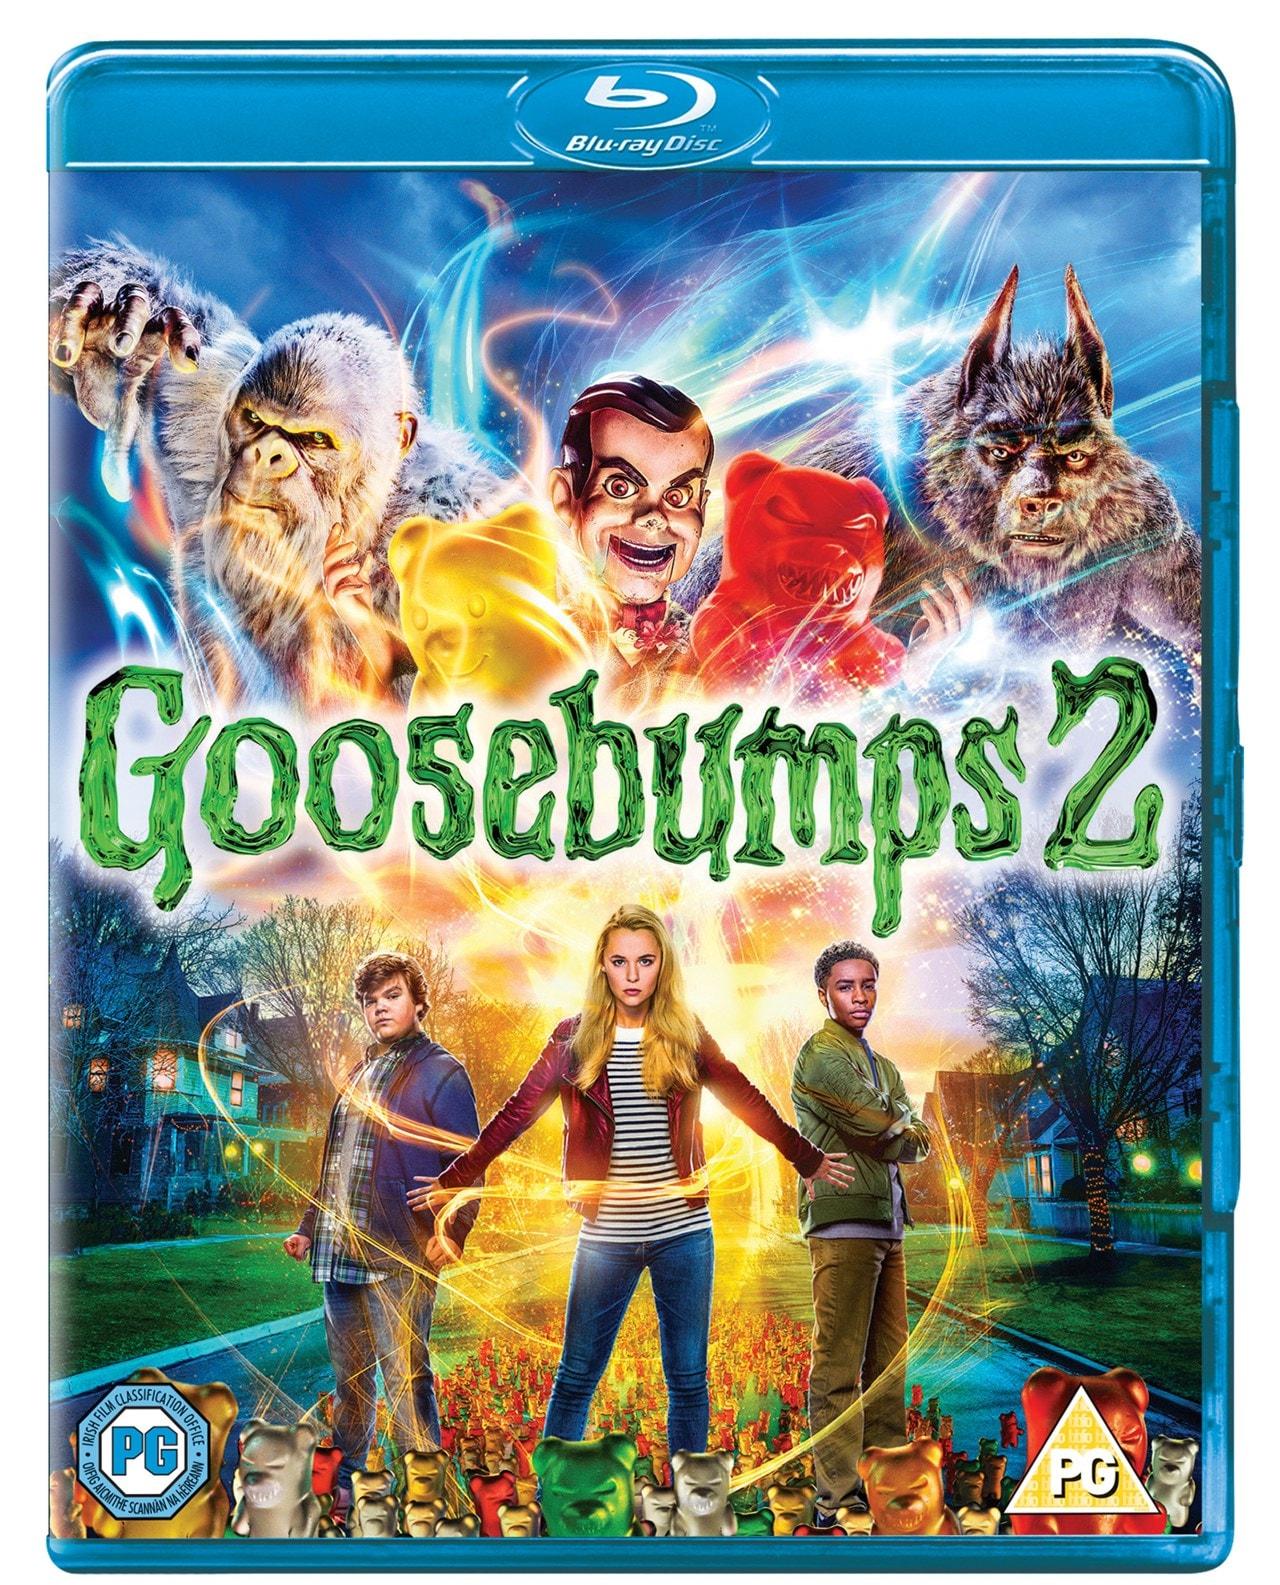 Goosebumps 2 - 1